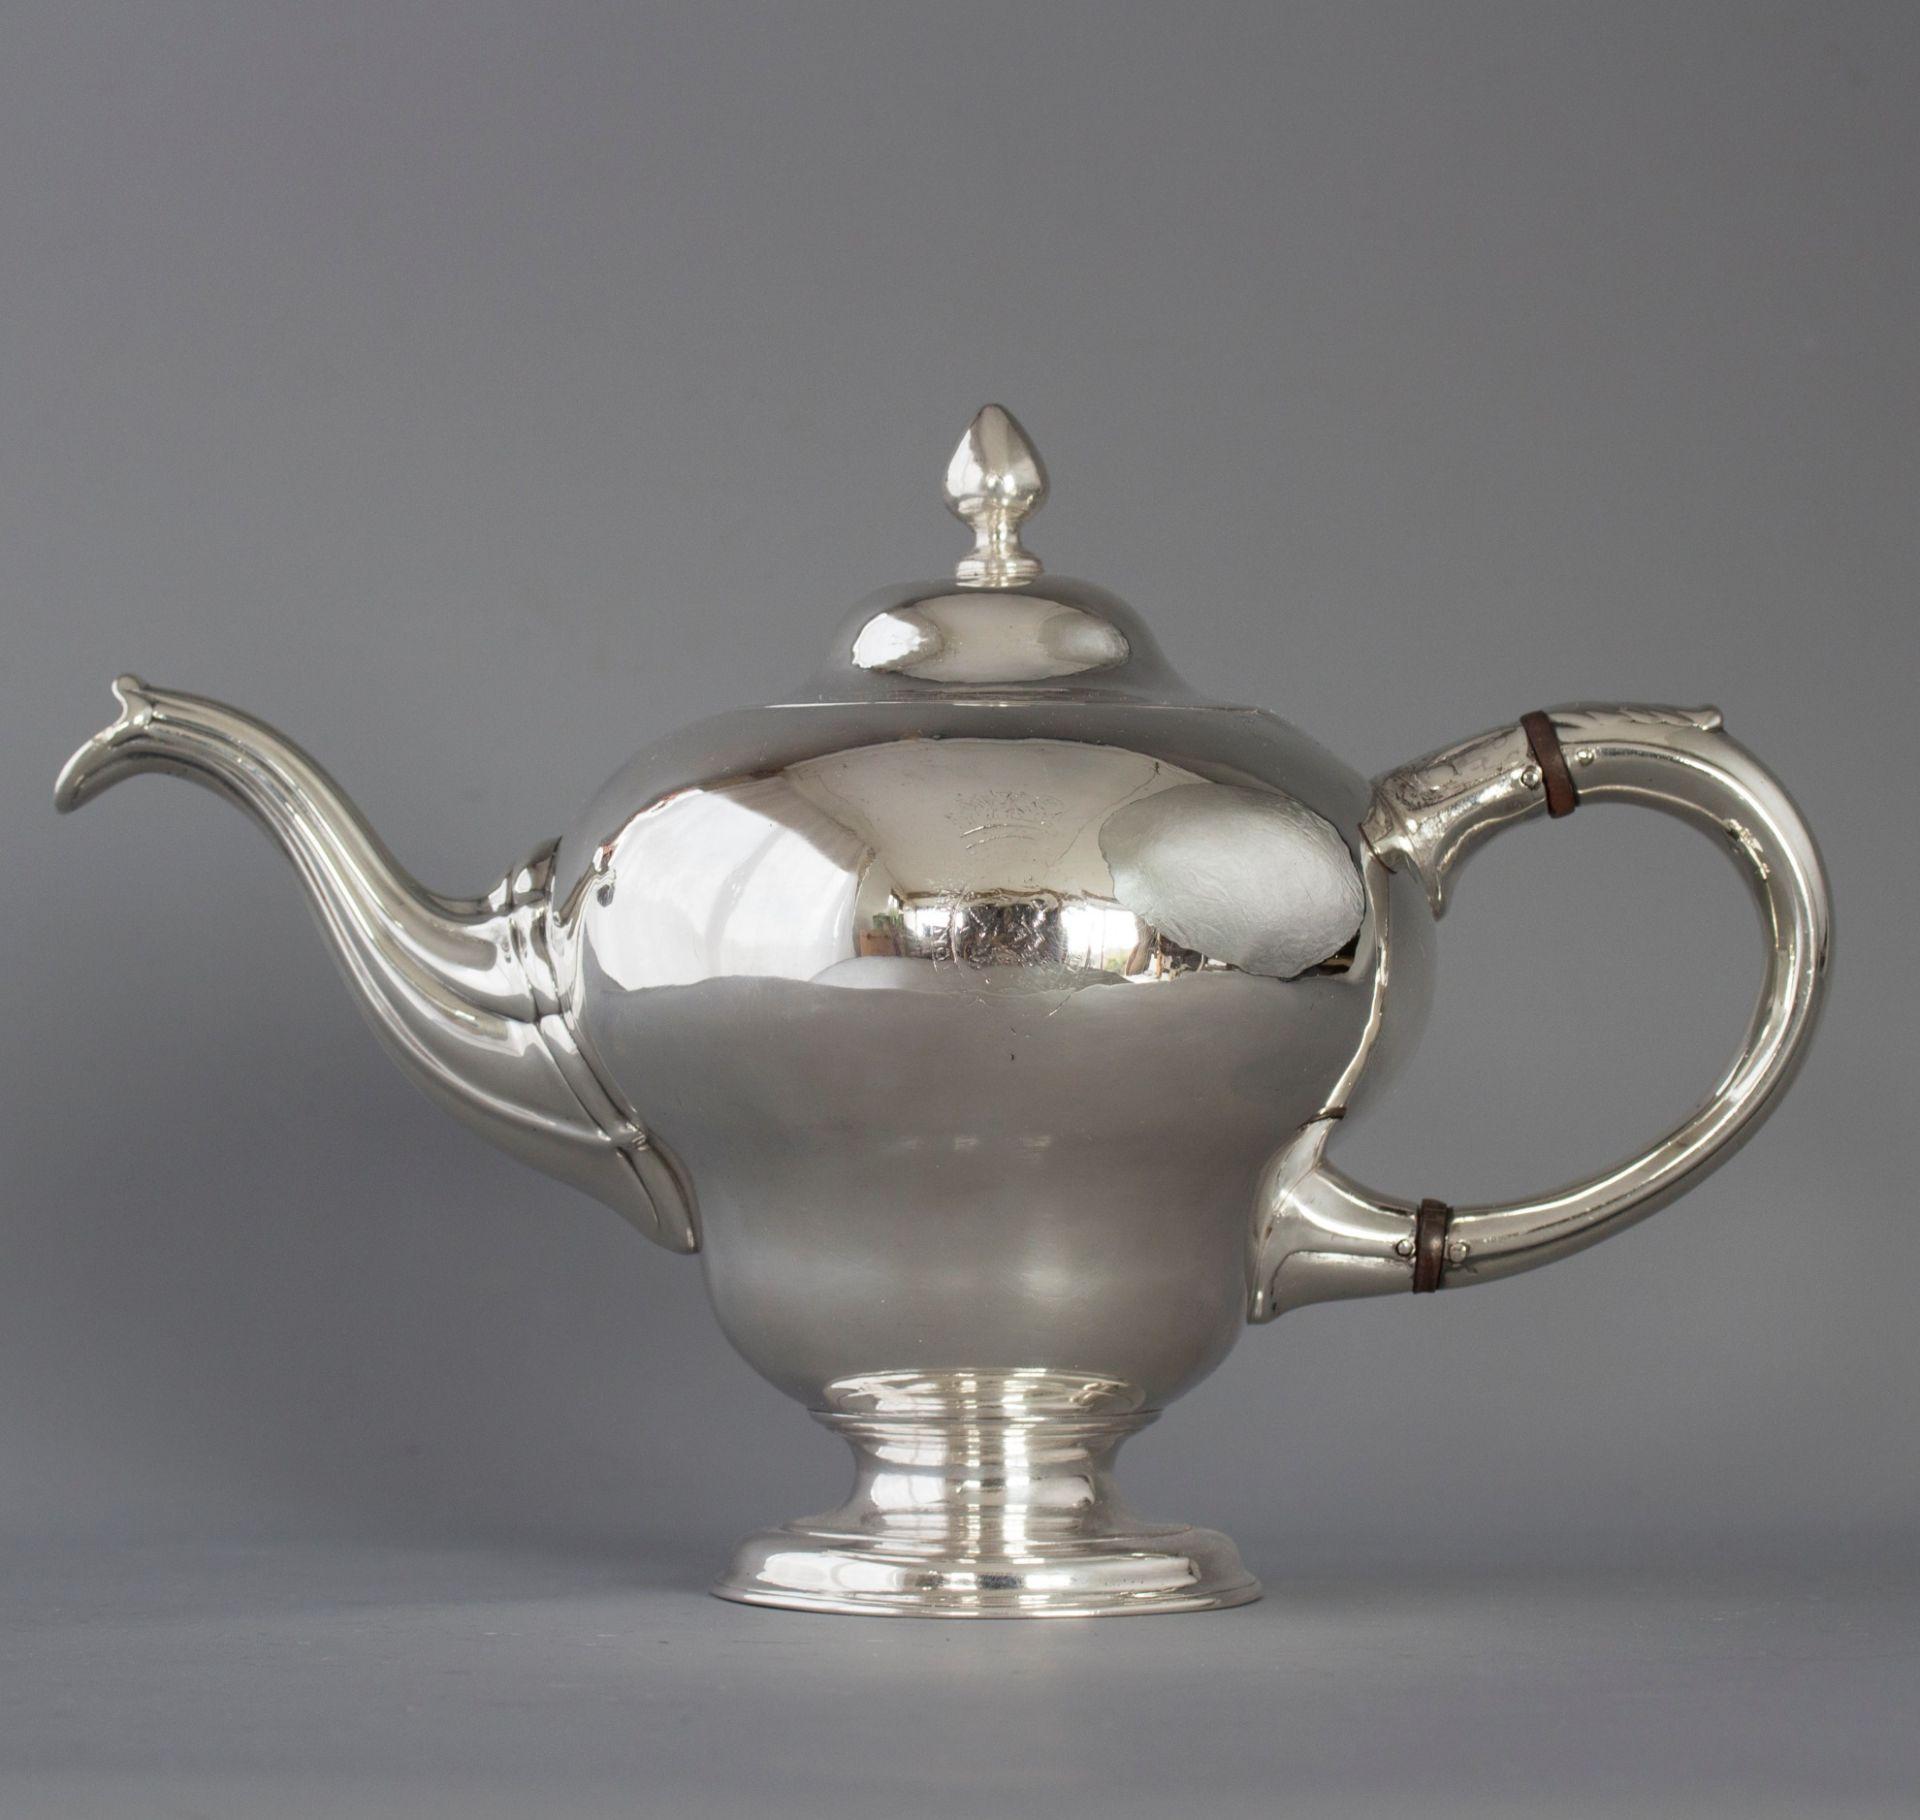 A Superb George II Scottish Silver Teapot, by Edward Lothian, Edinburgh 1749